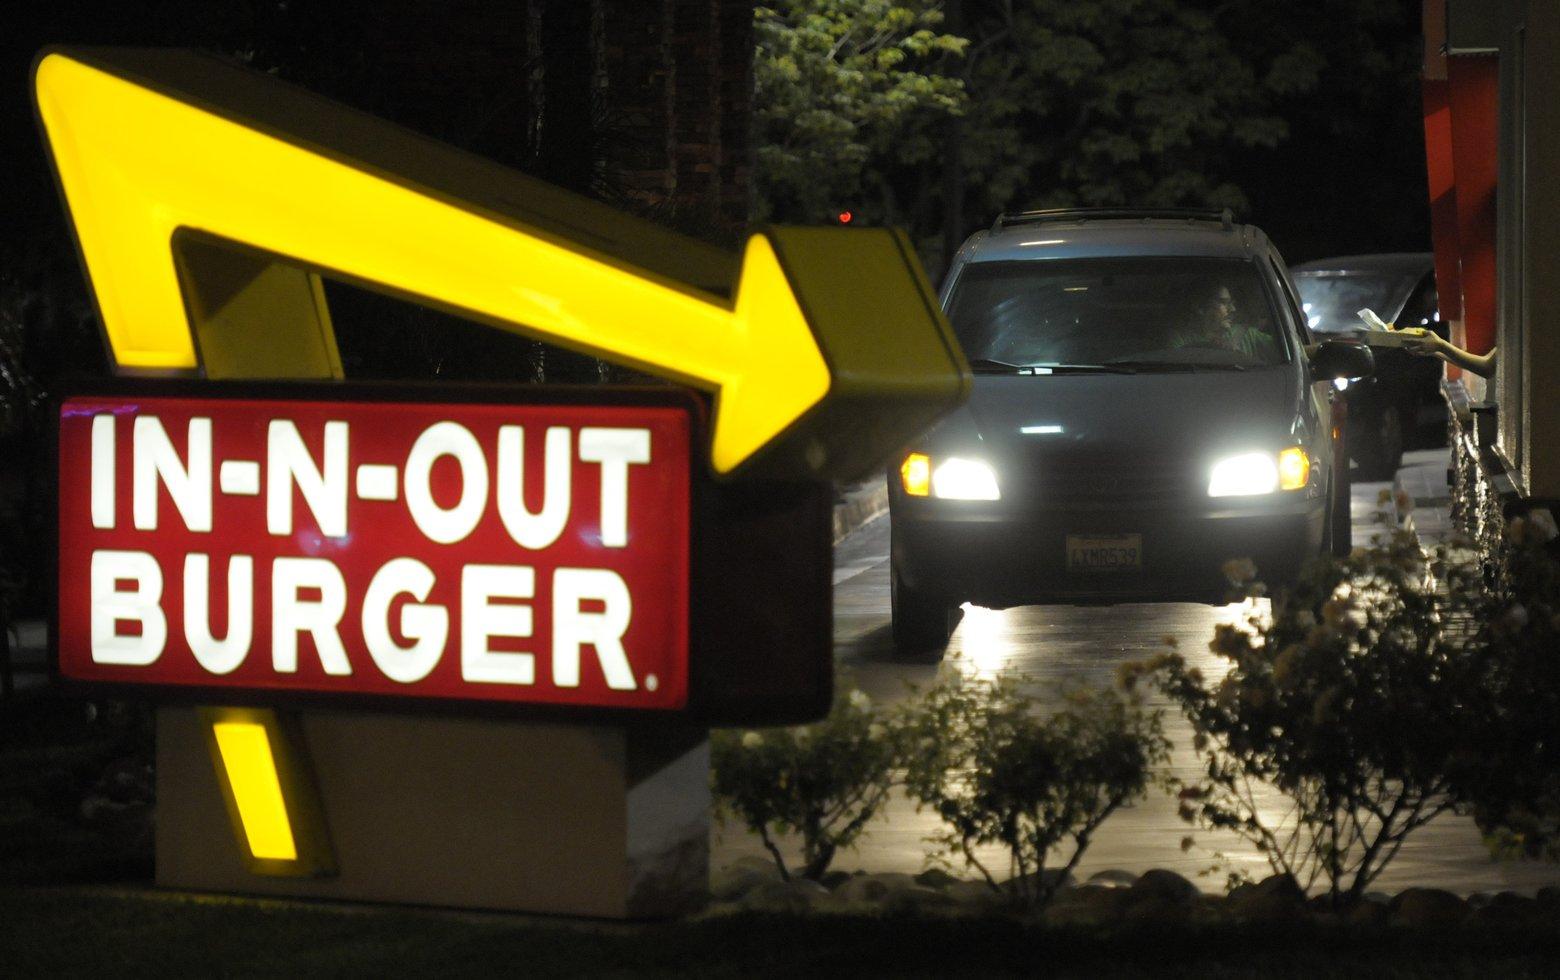 DRIVE THRU IN N OUT BURGERS